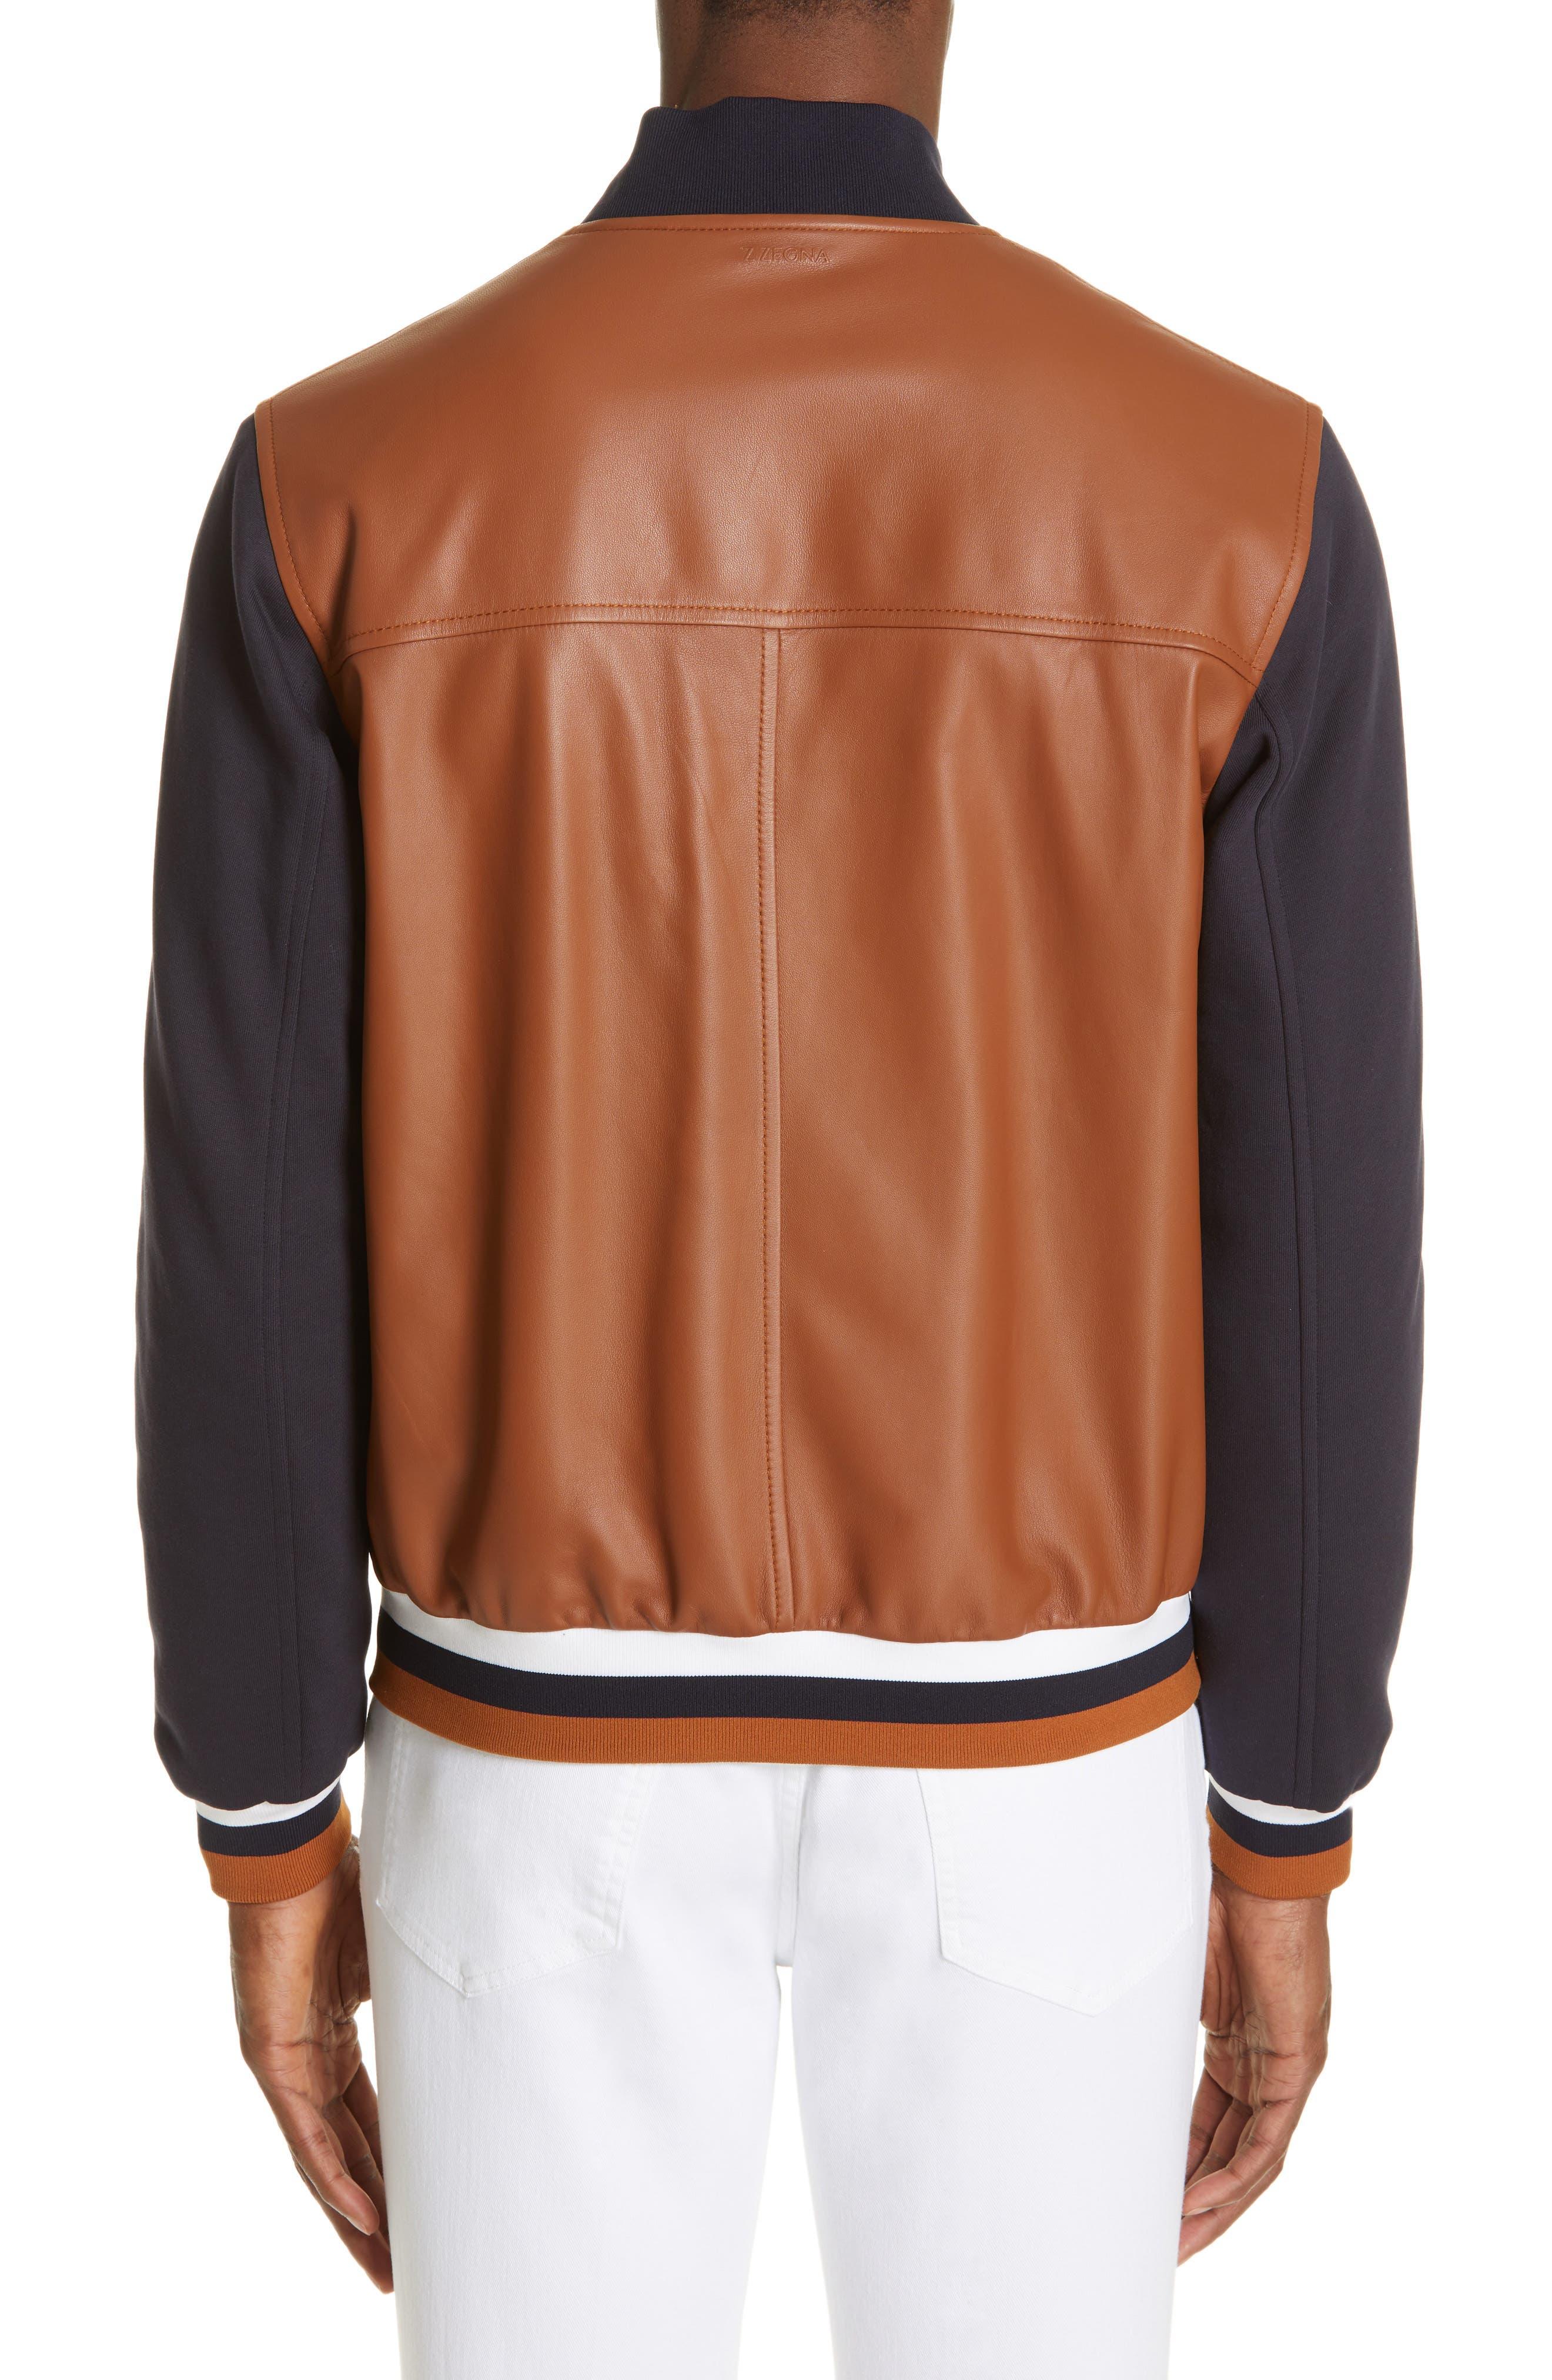 Z ZEGNA, Contrast Leather Bomber Jacket, Alternate thumbnail 2, color, NAVY/ BROWN